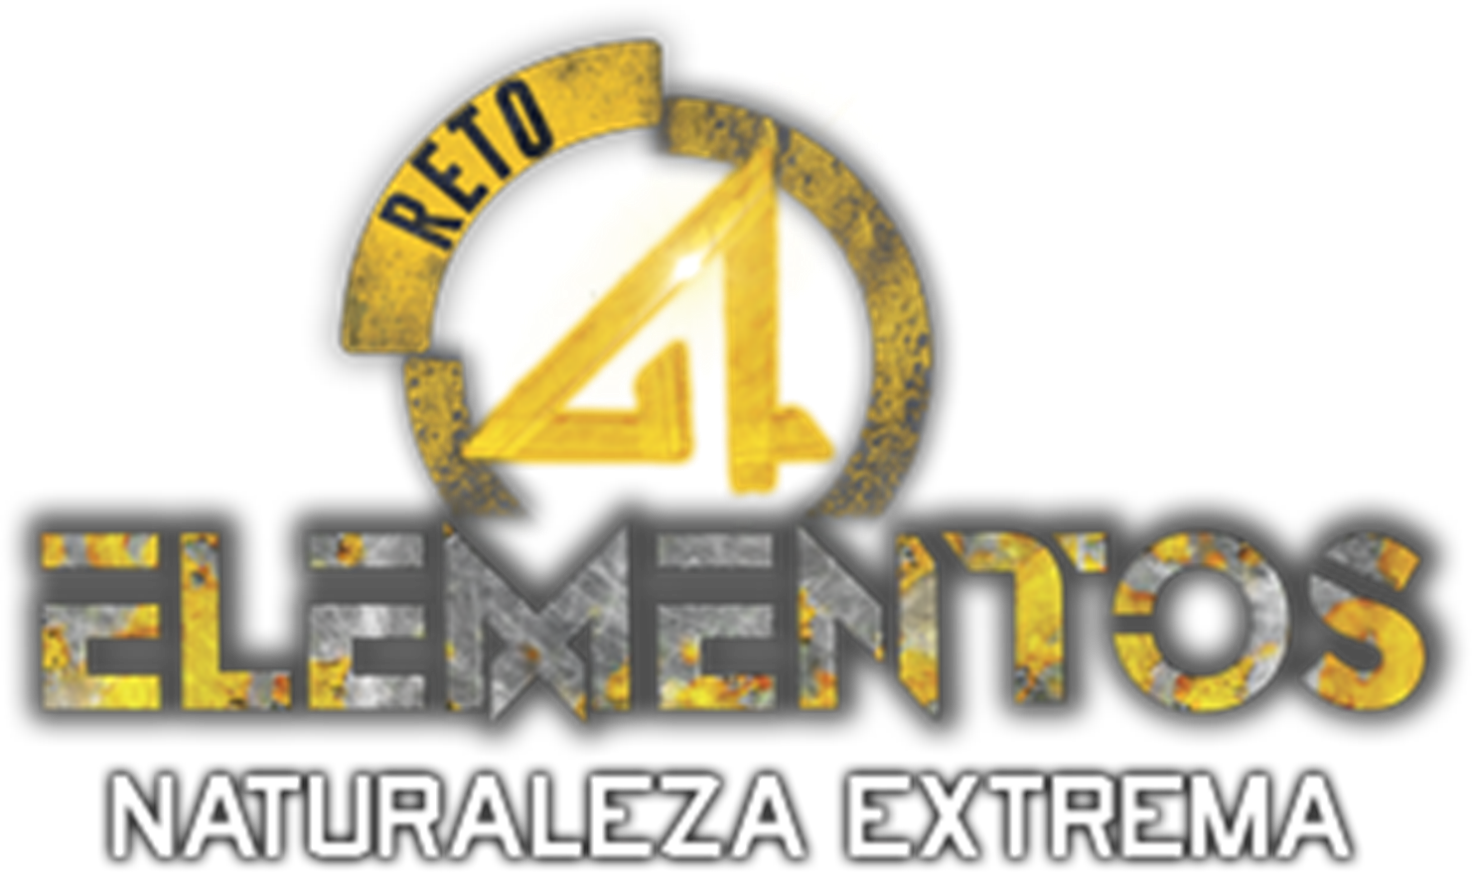 Reto 4 Elementos (Mexico)